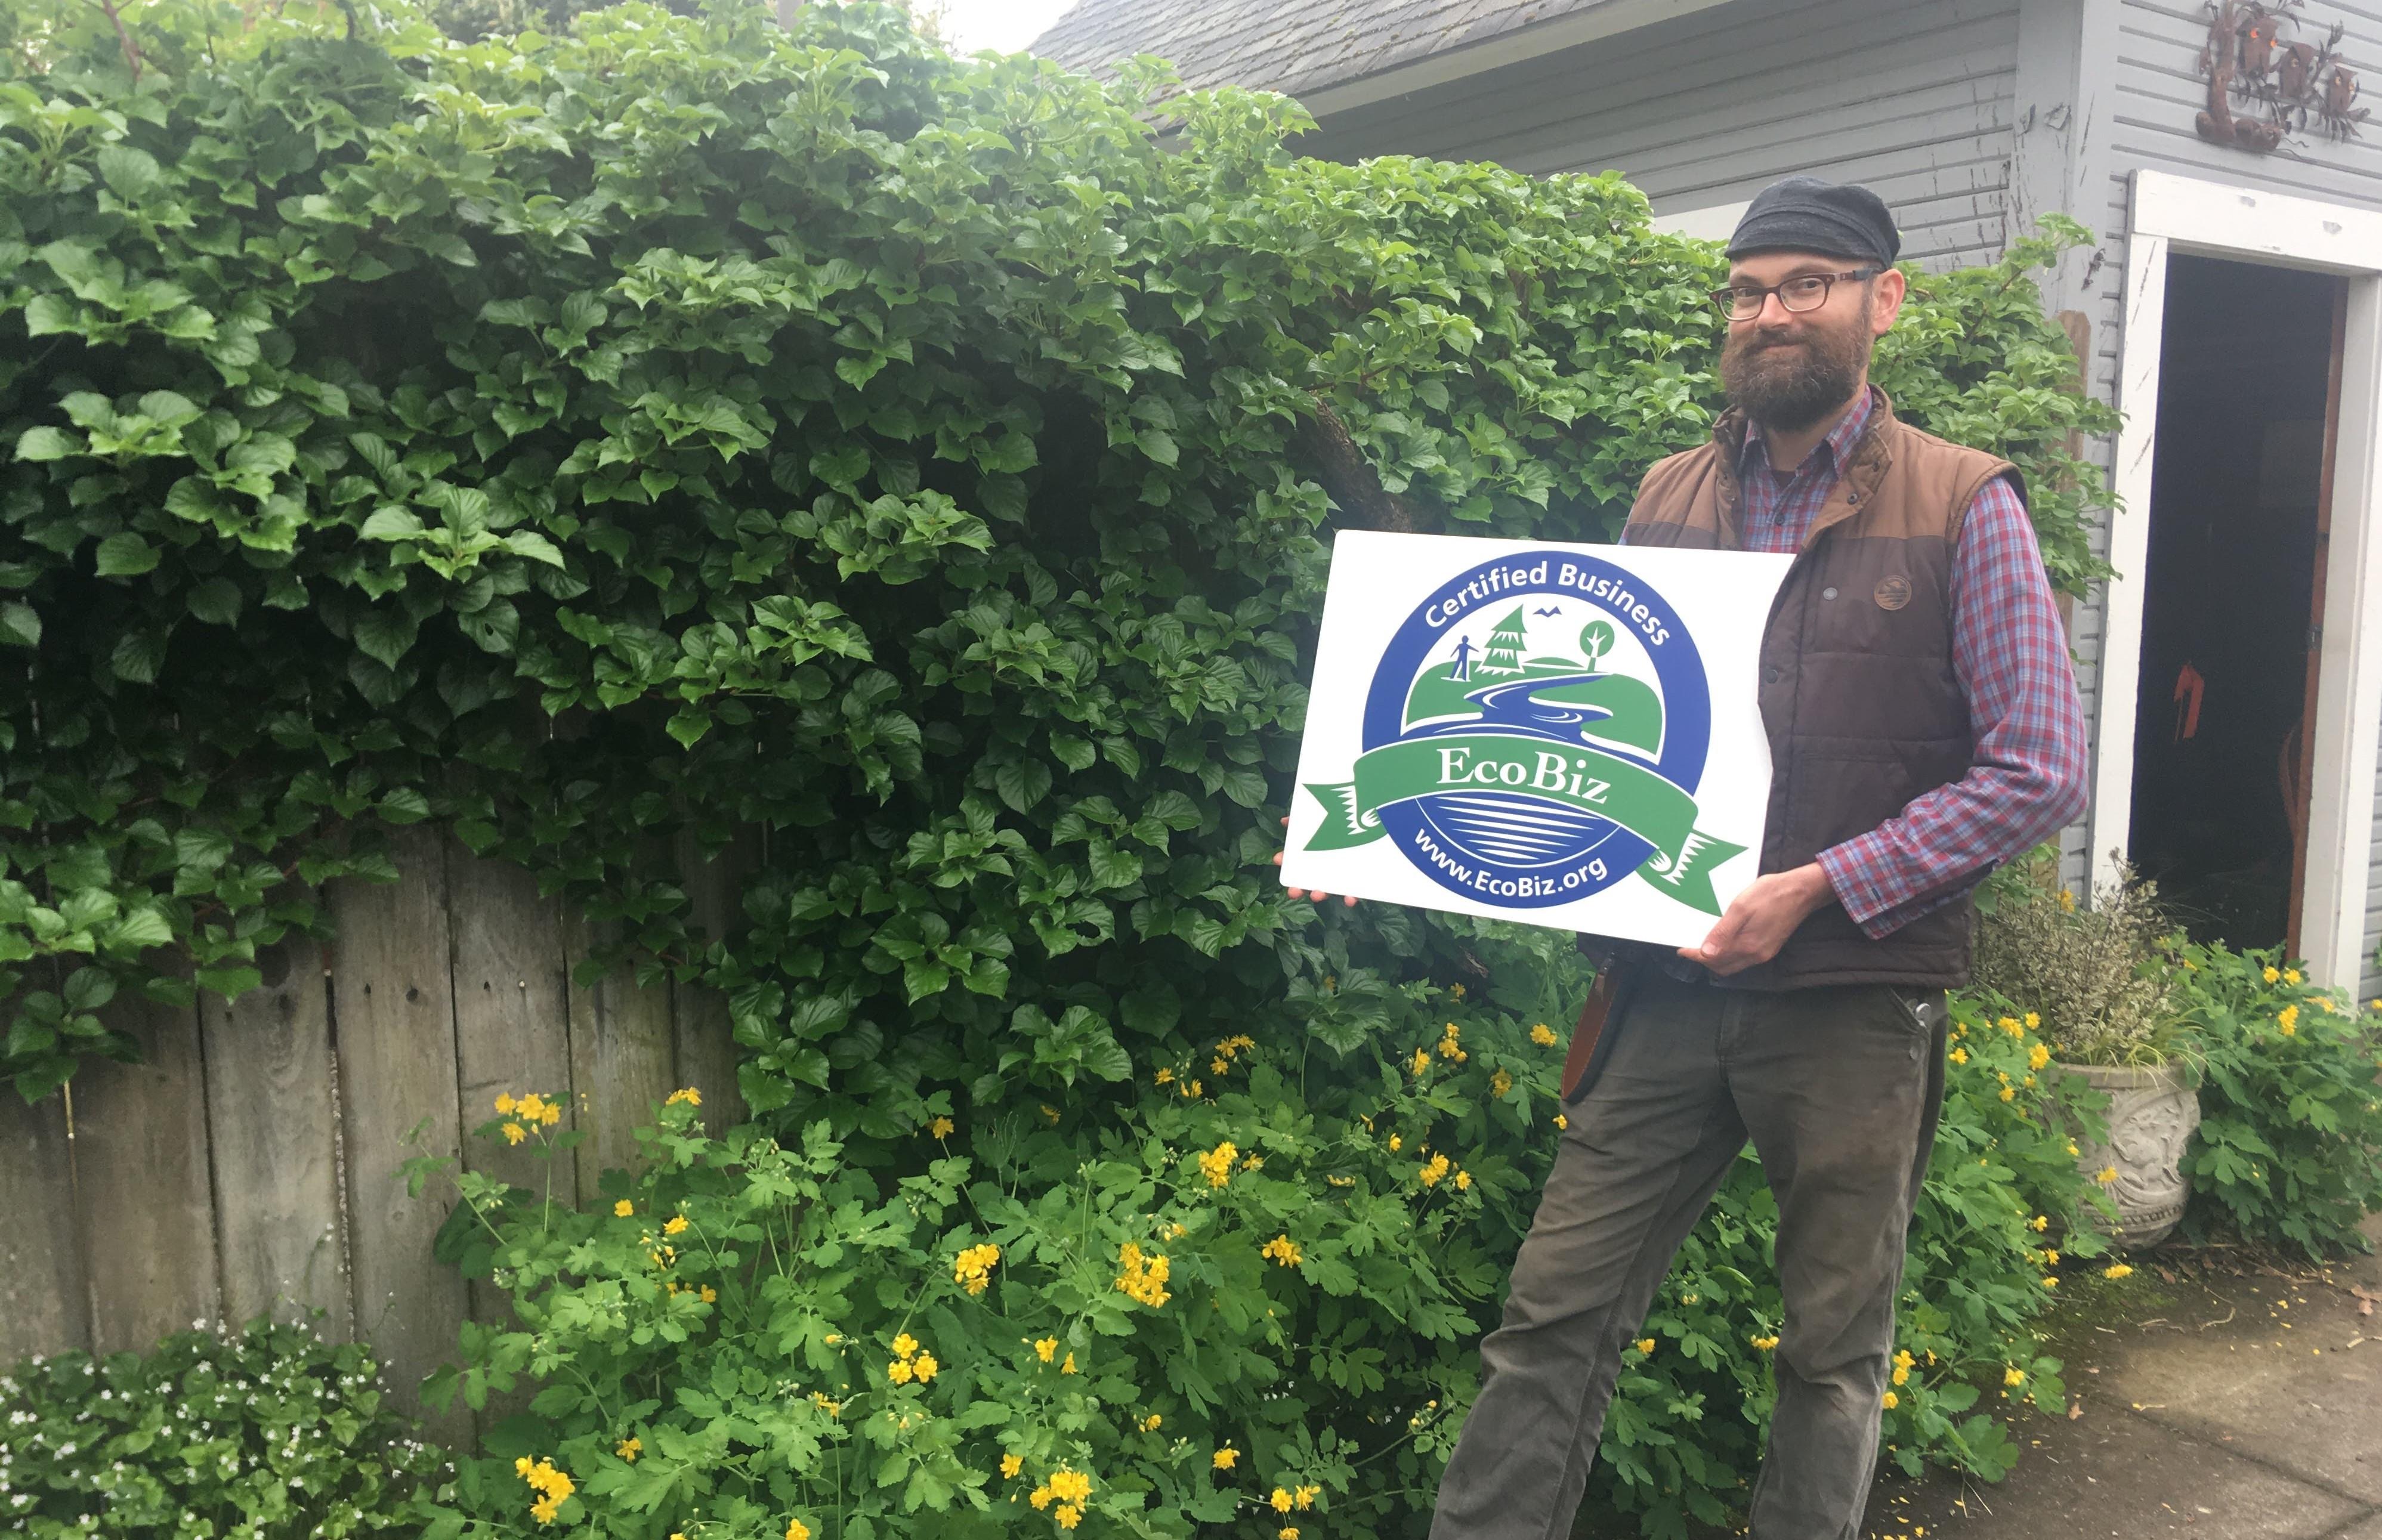 Amaranth Organic Gardening – EcoBiz Certified